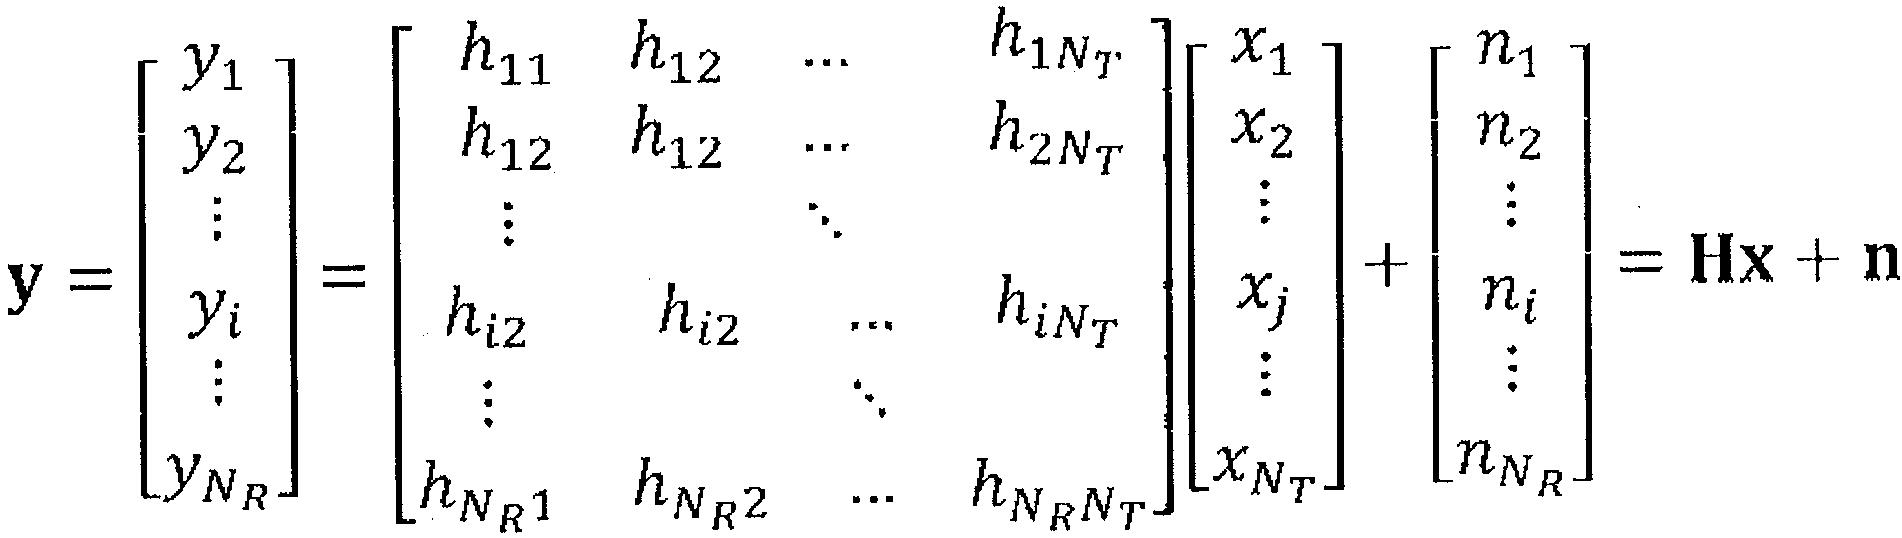 Figure 112011502812217-pat00132